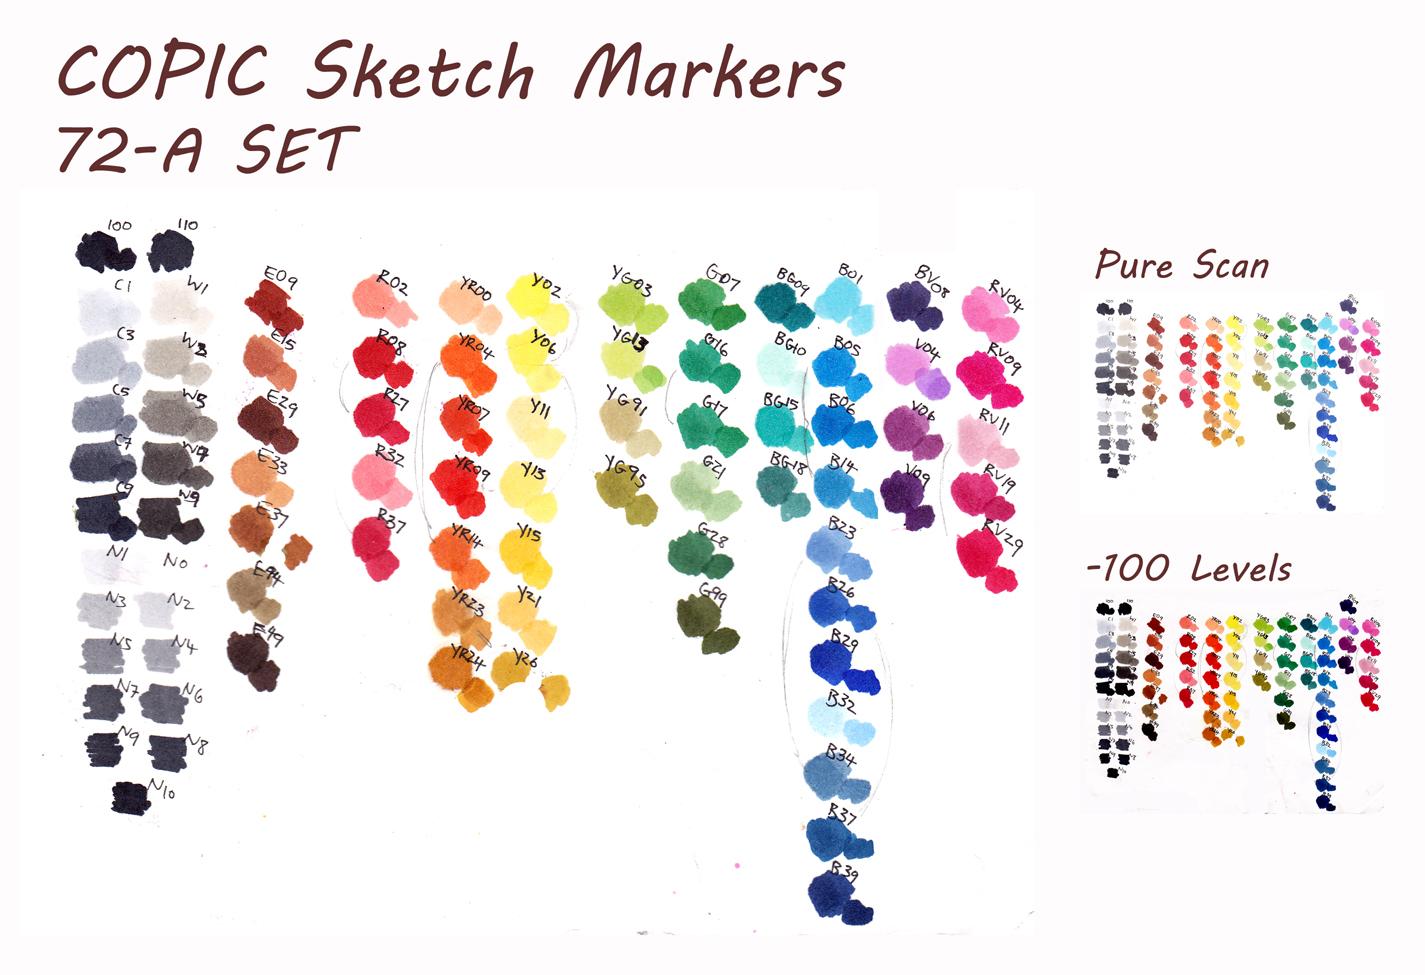 Copic Sketch Marker Kit La La Land Crafts